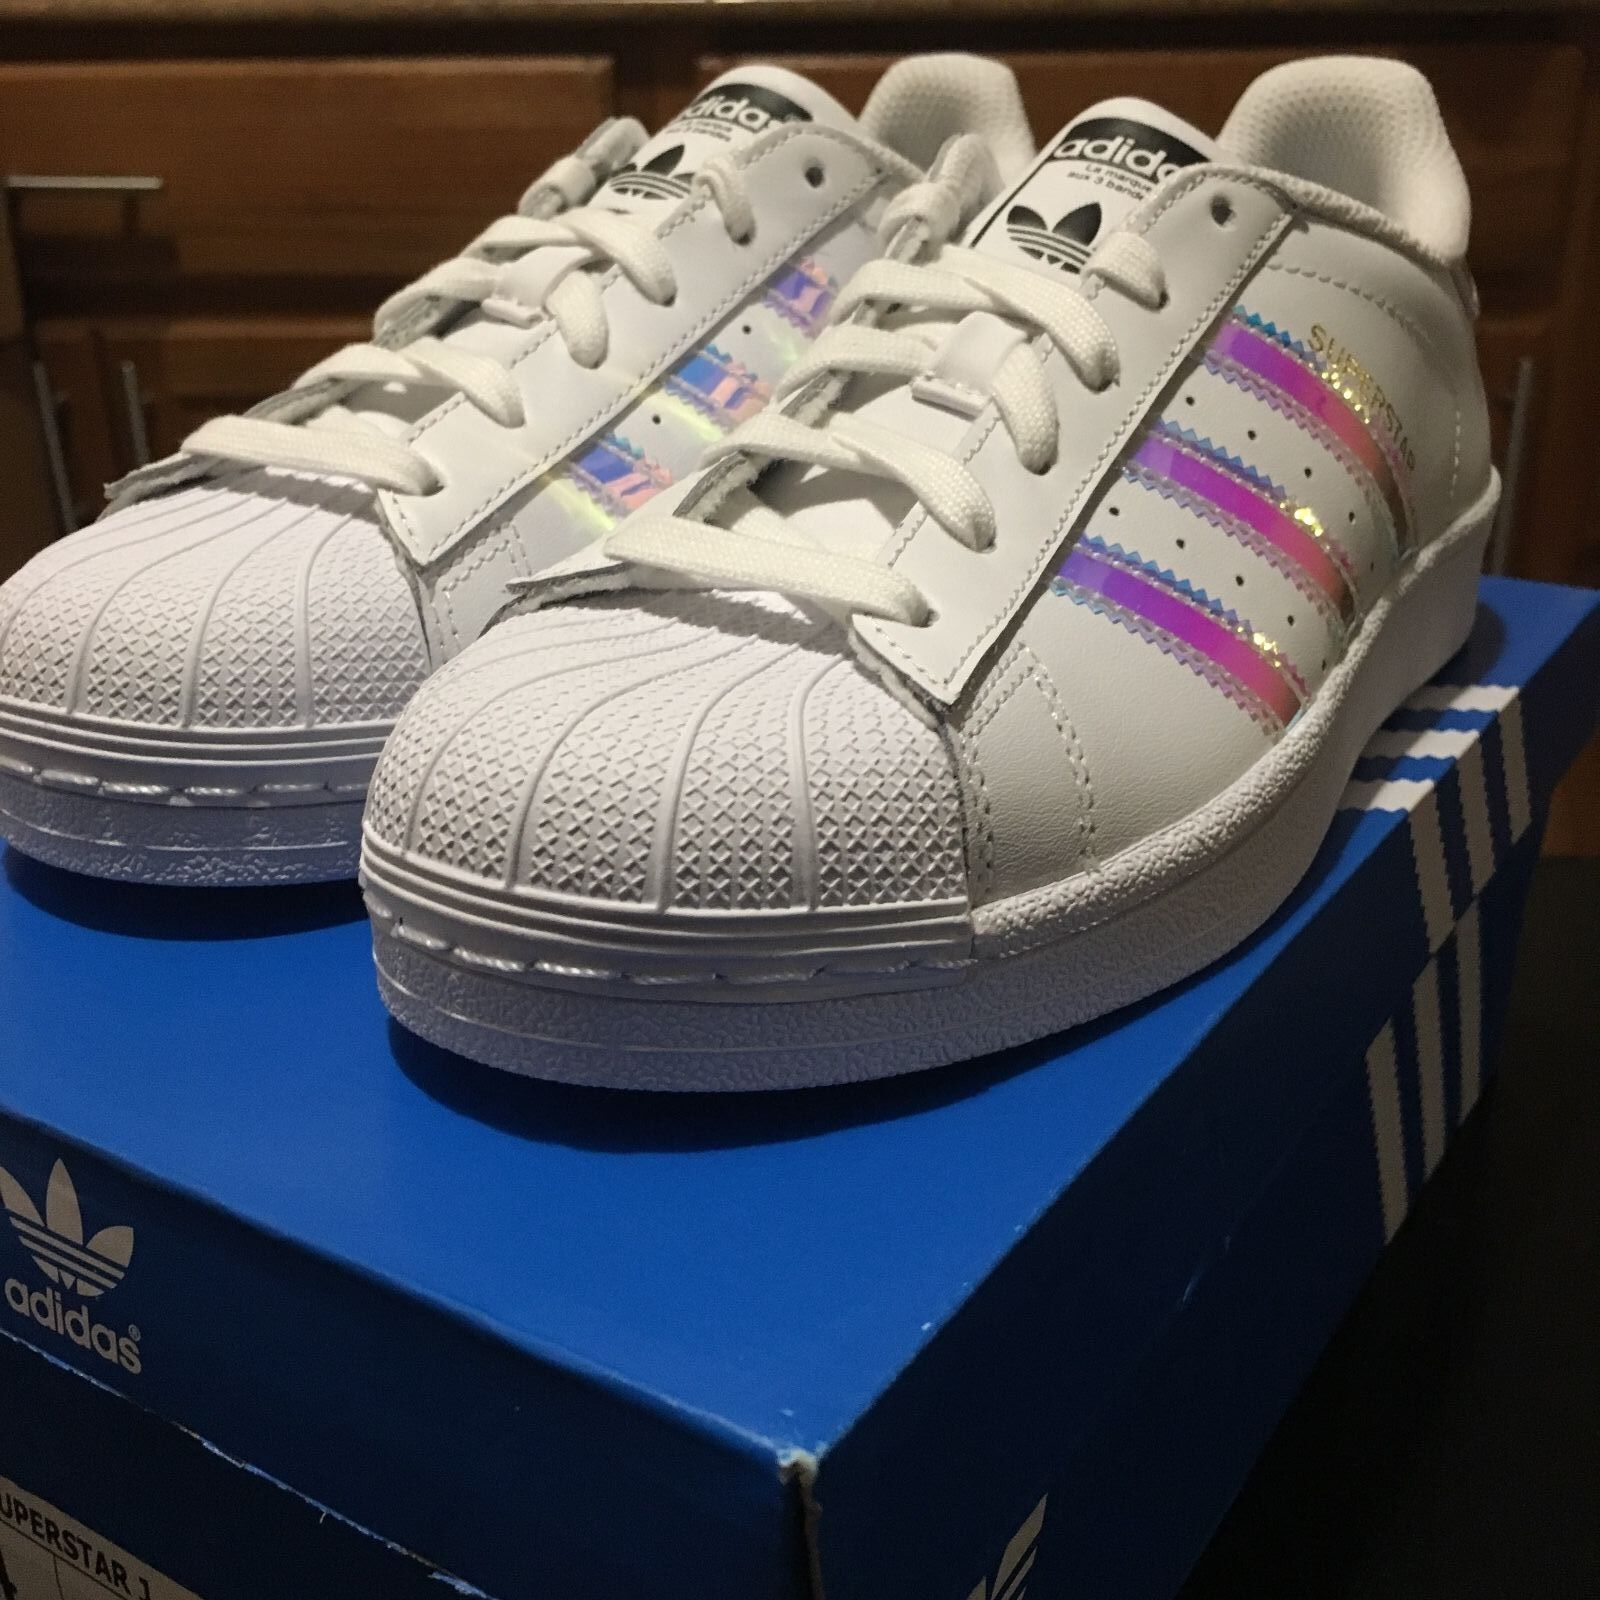 Adidas Originals Superstar J AQ6278 White Iridescent